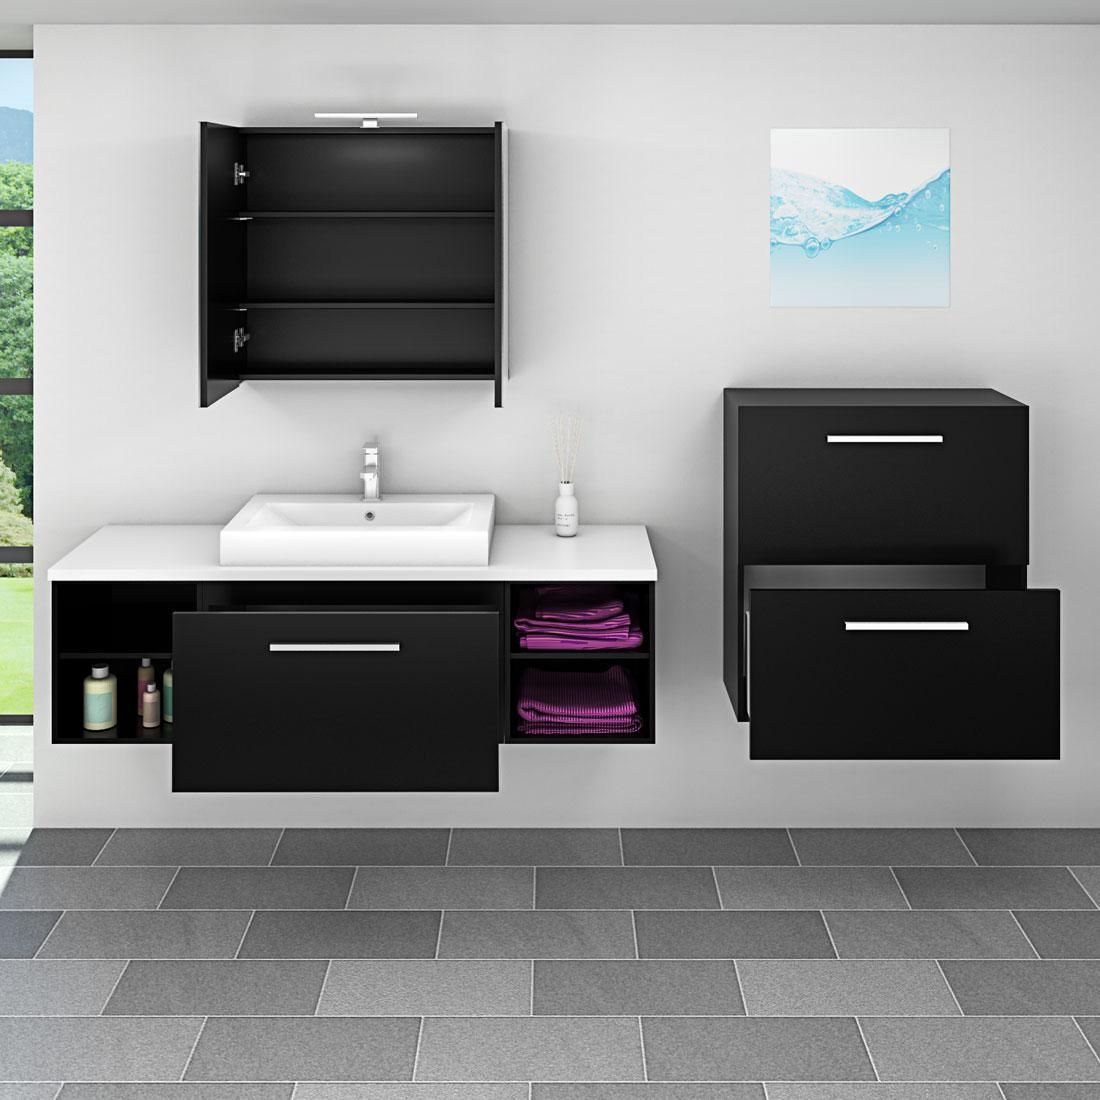 badm bel set city 302 v6 esche schwarz badezimmerm bel waschtisch 160cm. Black Bedroom Furniture Sets. Home Design Ideas